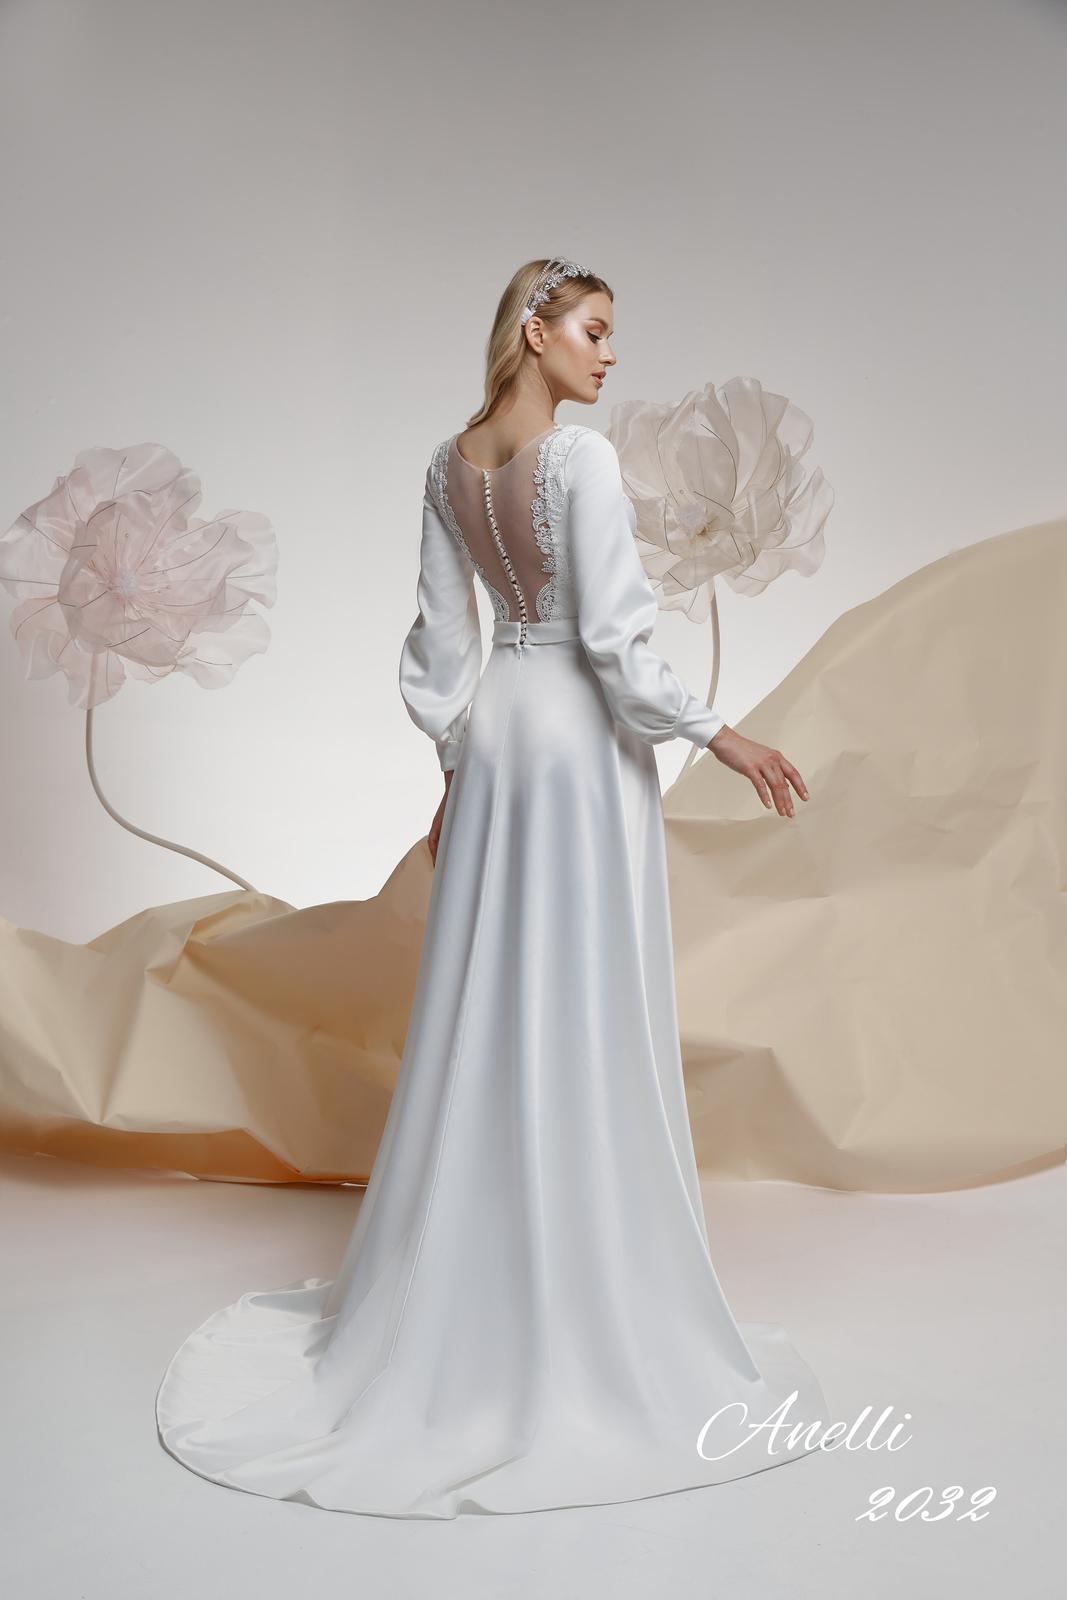 Svadobné šaty - Imagine 2032 - Obrázok č. 3